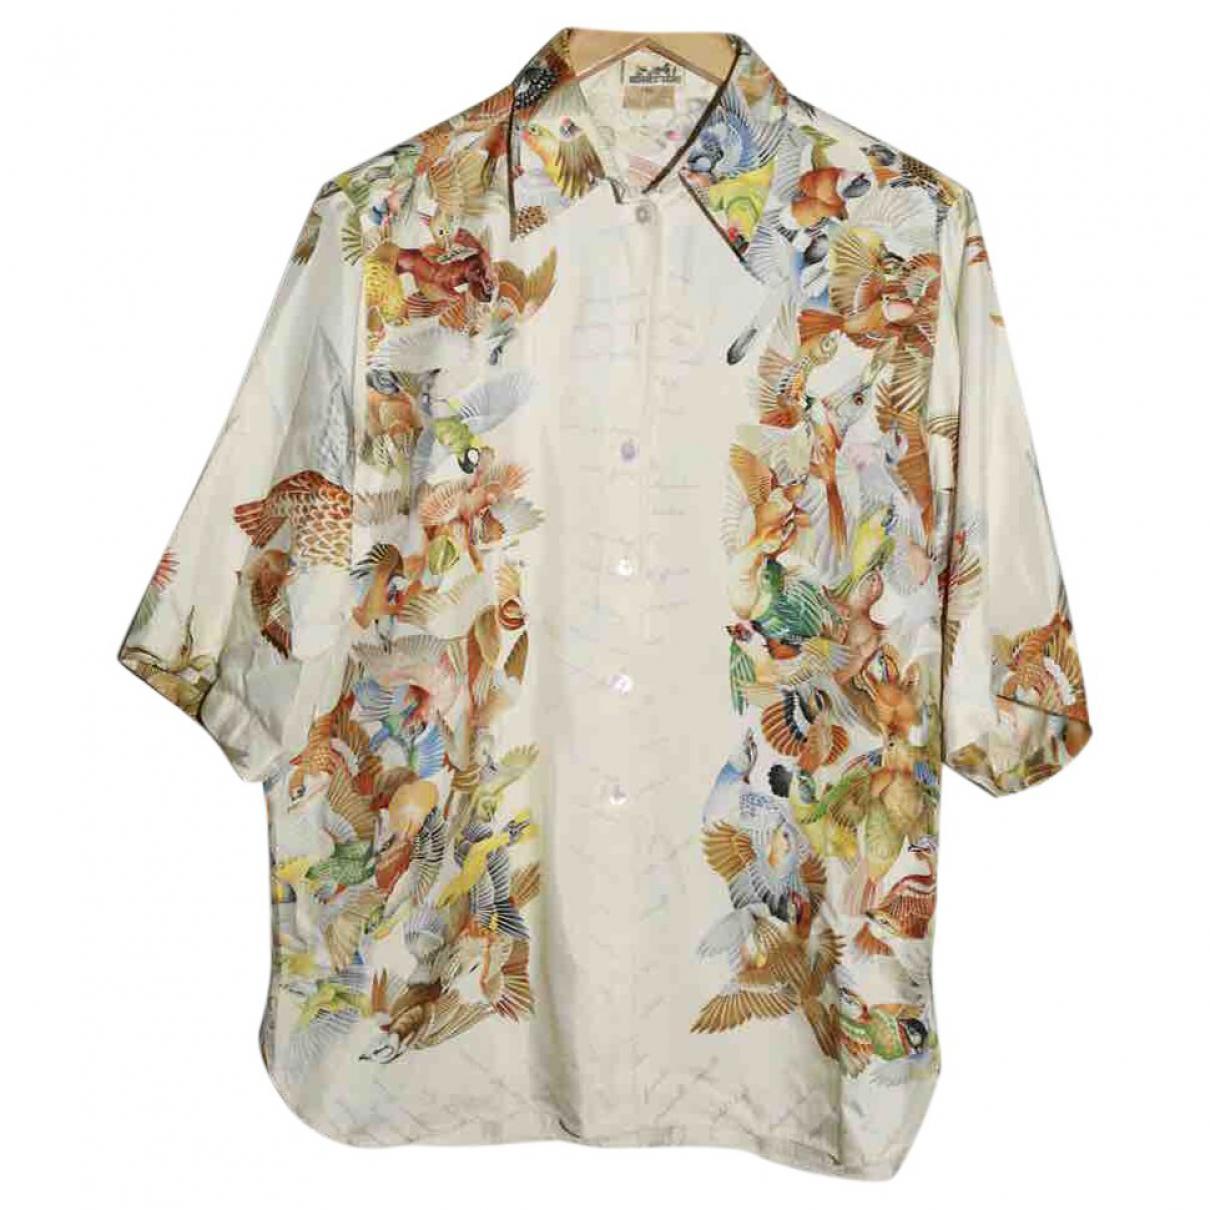 5da6d775ea3 Lyst - Hermès Vintage Multicolour Silk Top in Metallic